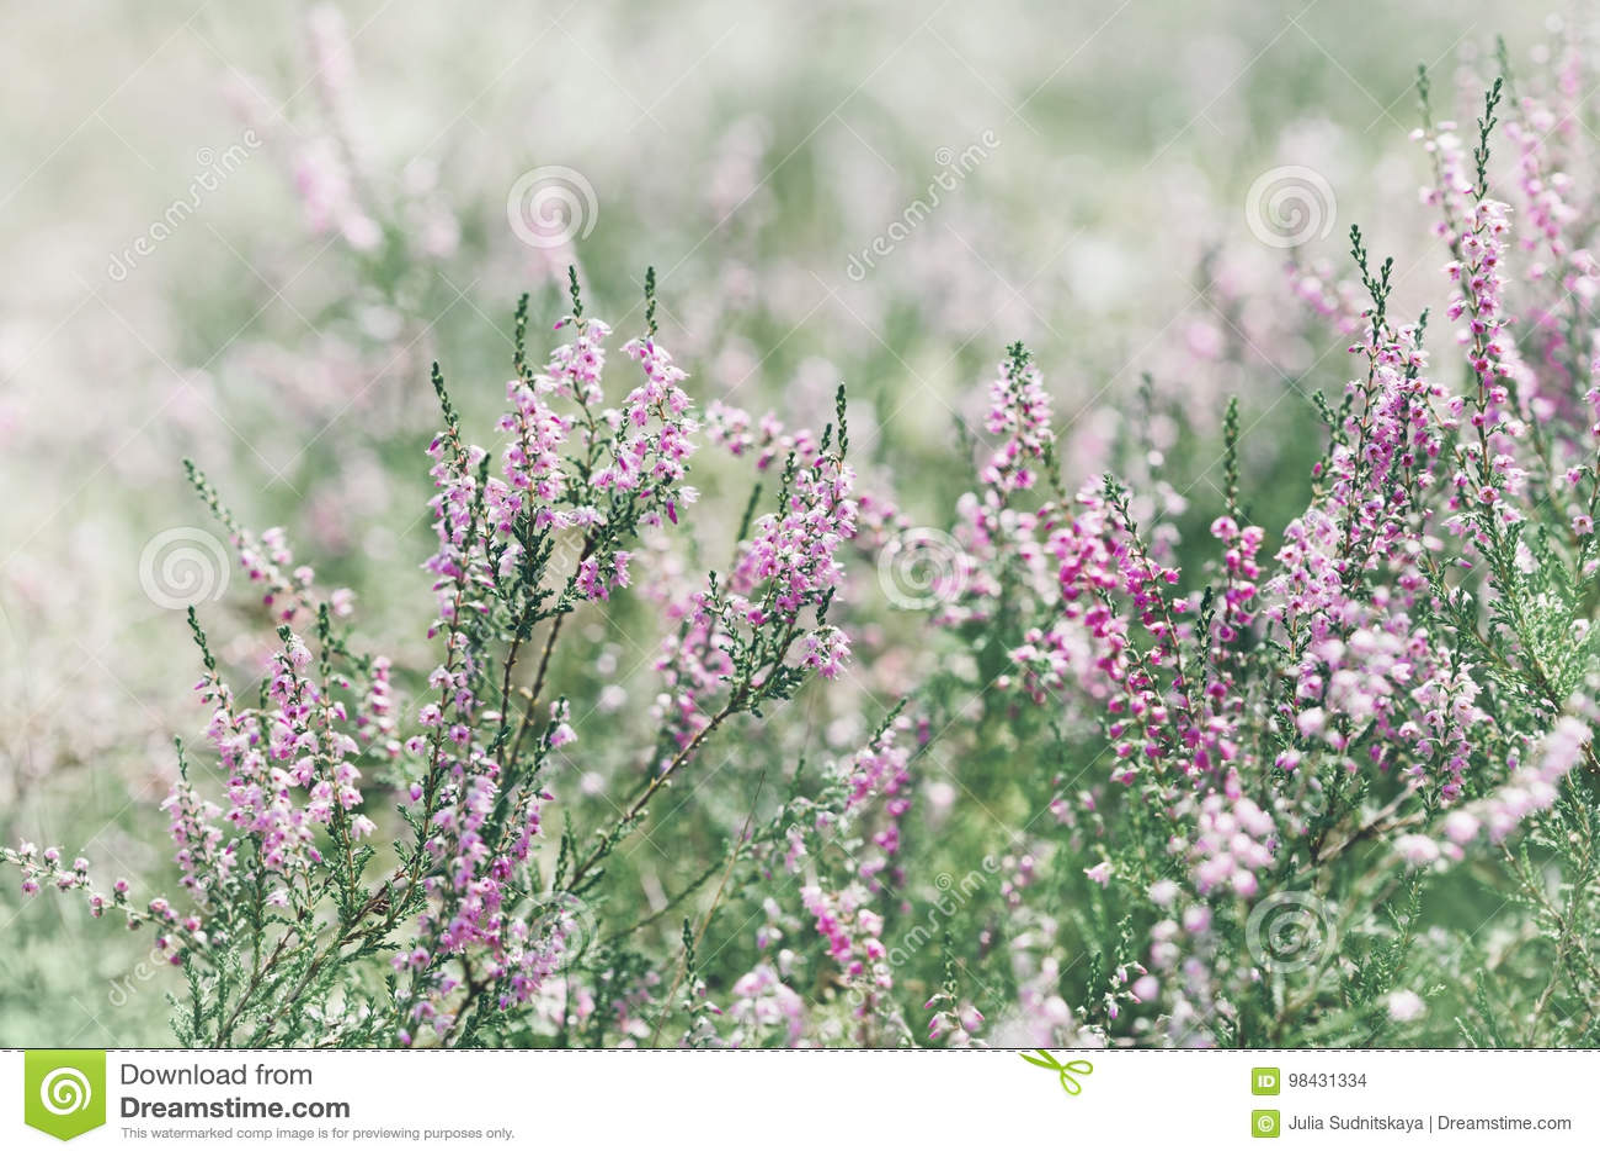 Blooming heather calluna vulgaris, erica, ling in forest.